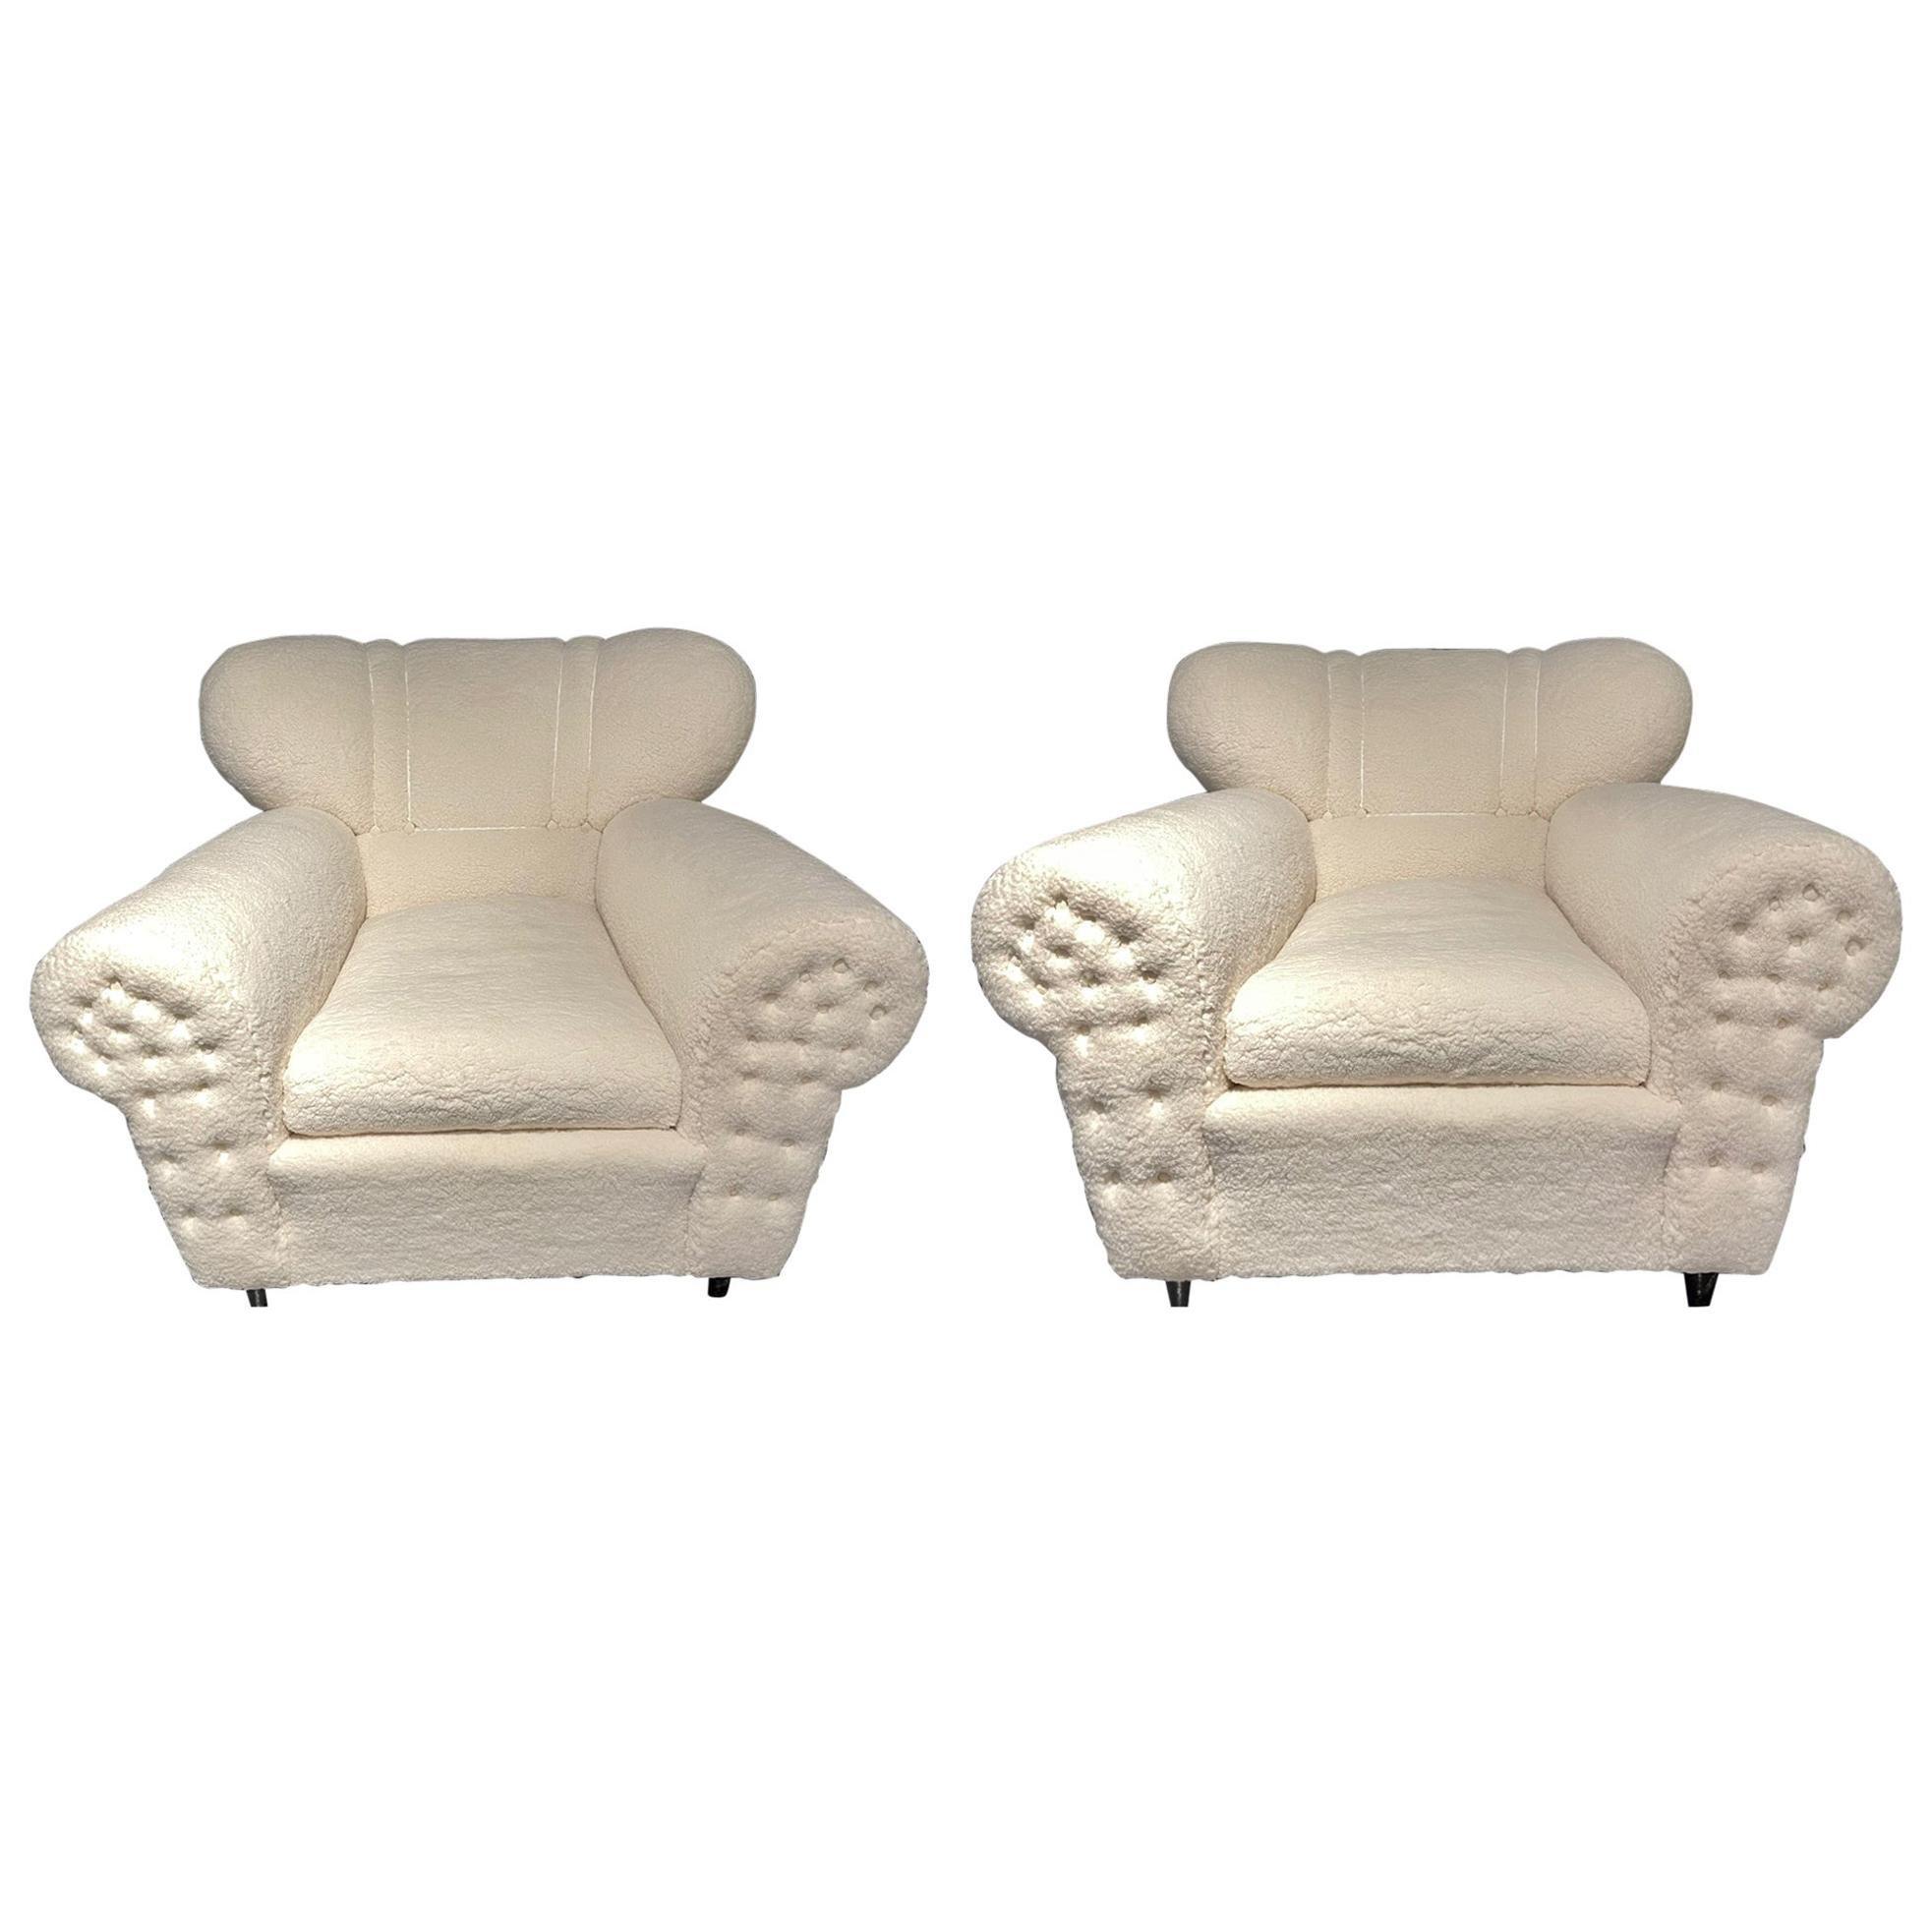 Mid-Century Modern Guglielmo Ulrich Lounge Chairs a Pair, Plush Sherpa Design